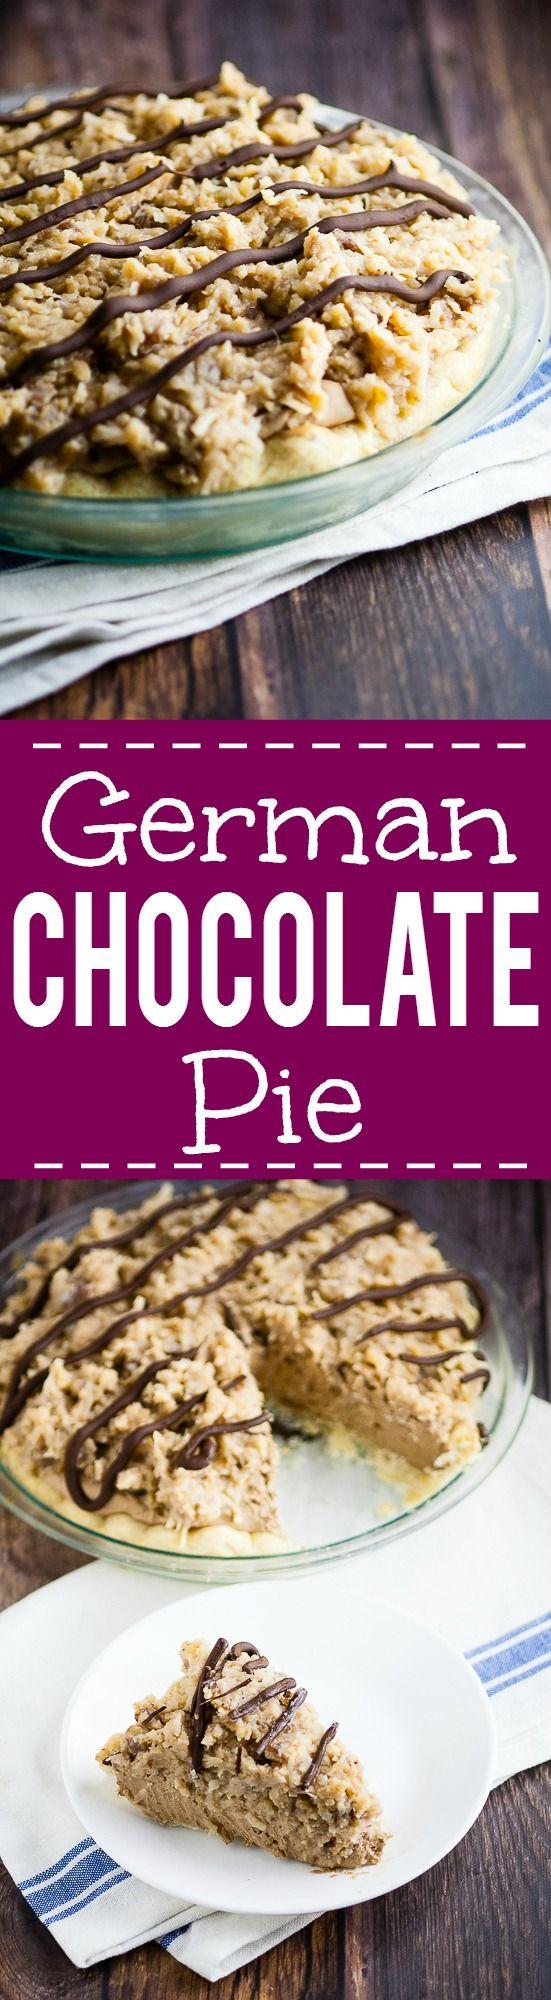 Best 20+ German chocolate pies ideas on Pinterest ...